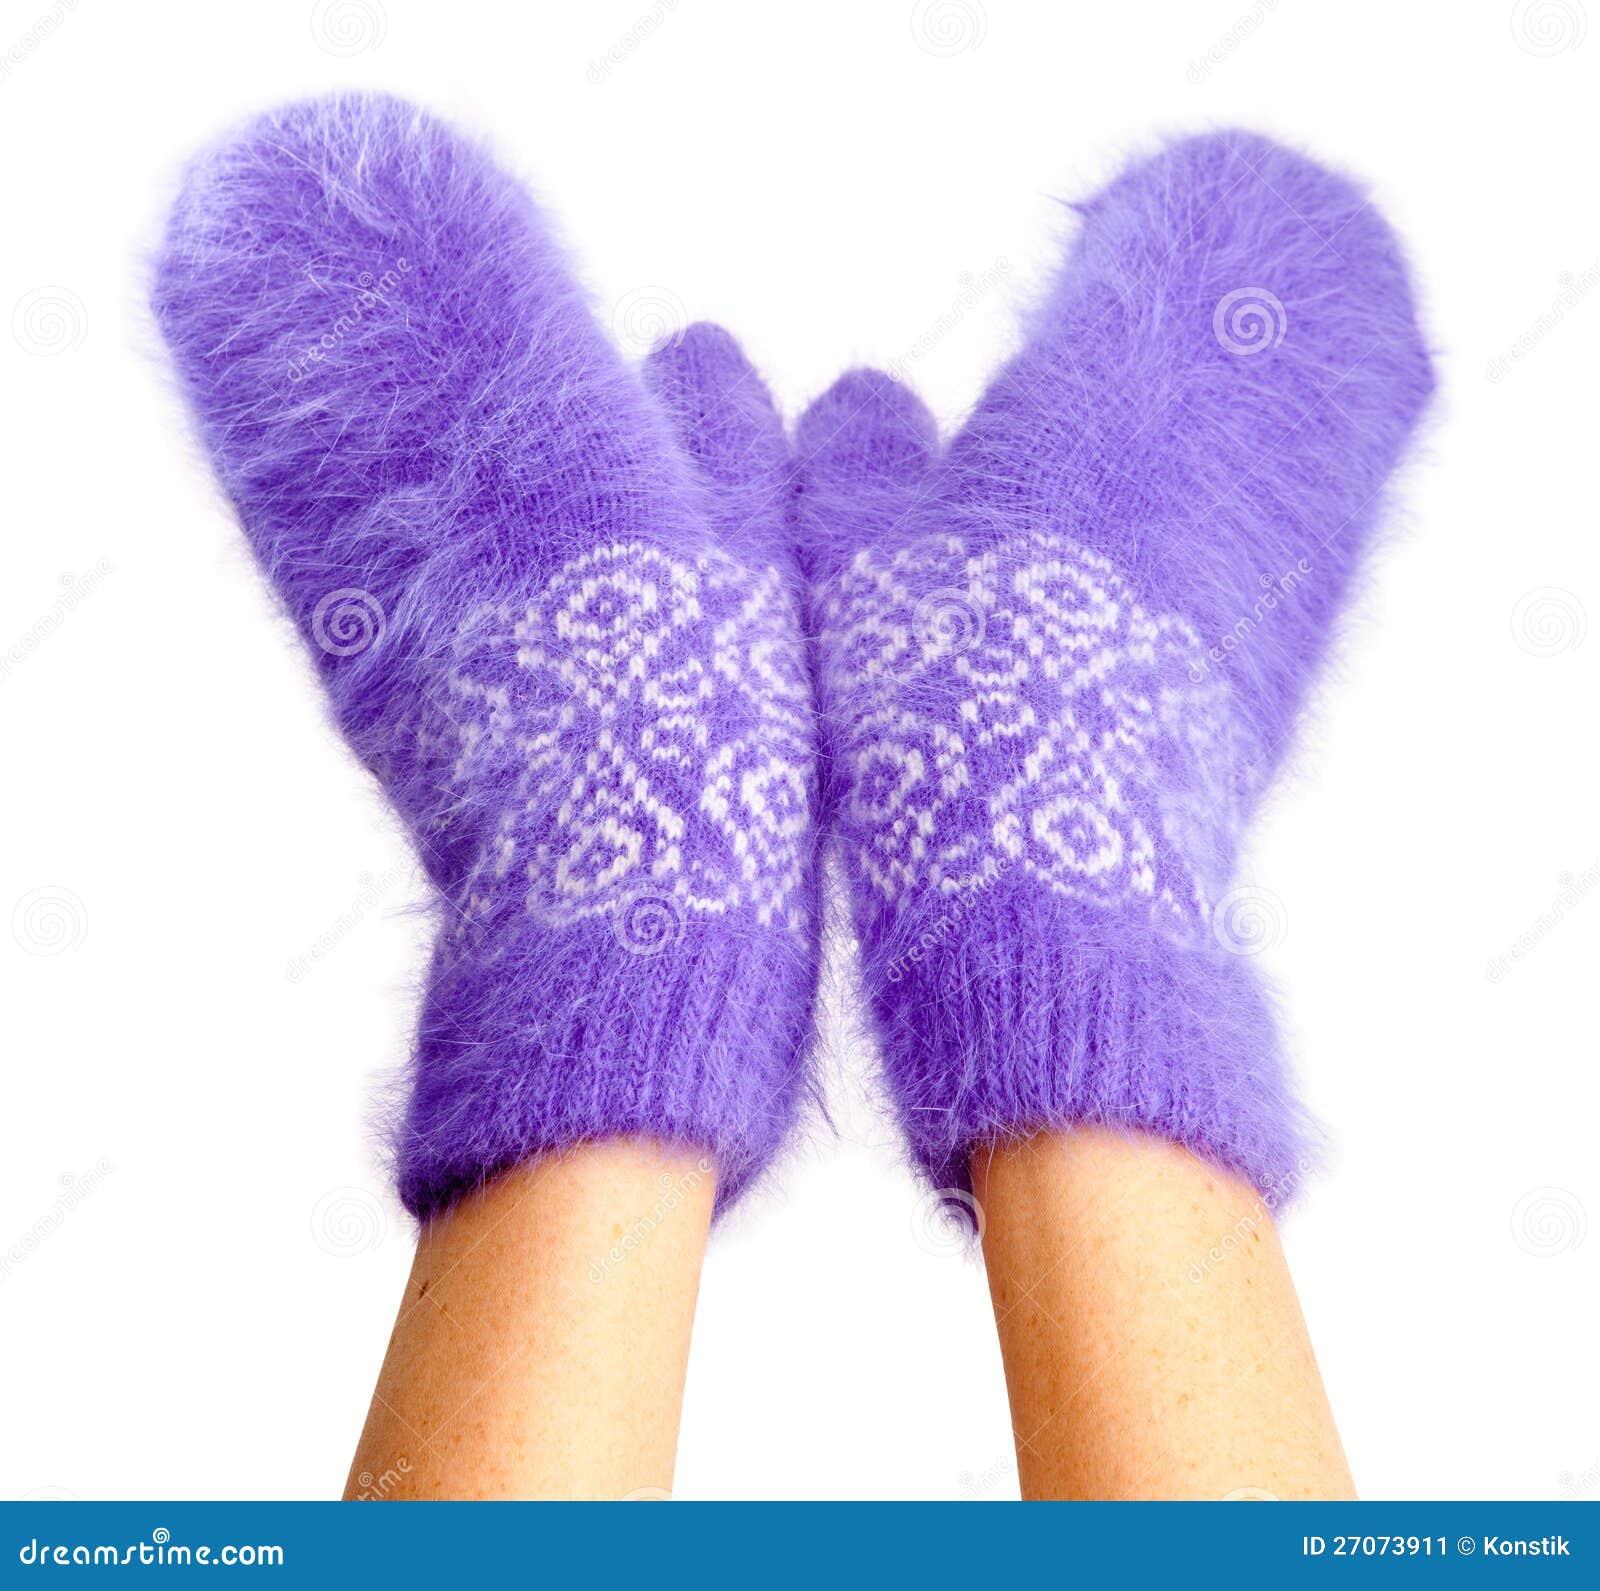 Female hands in mittens